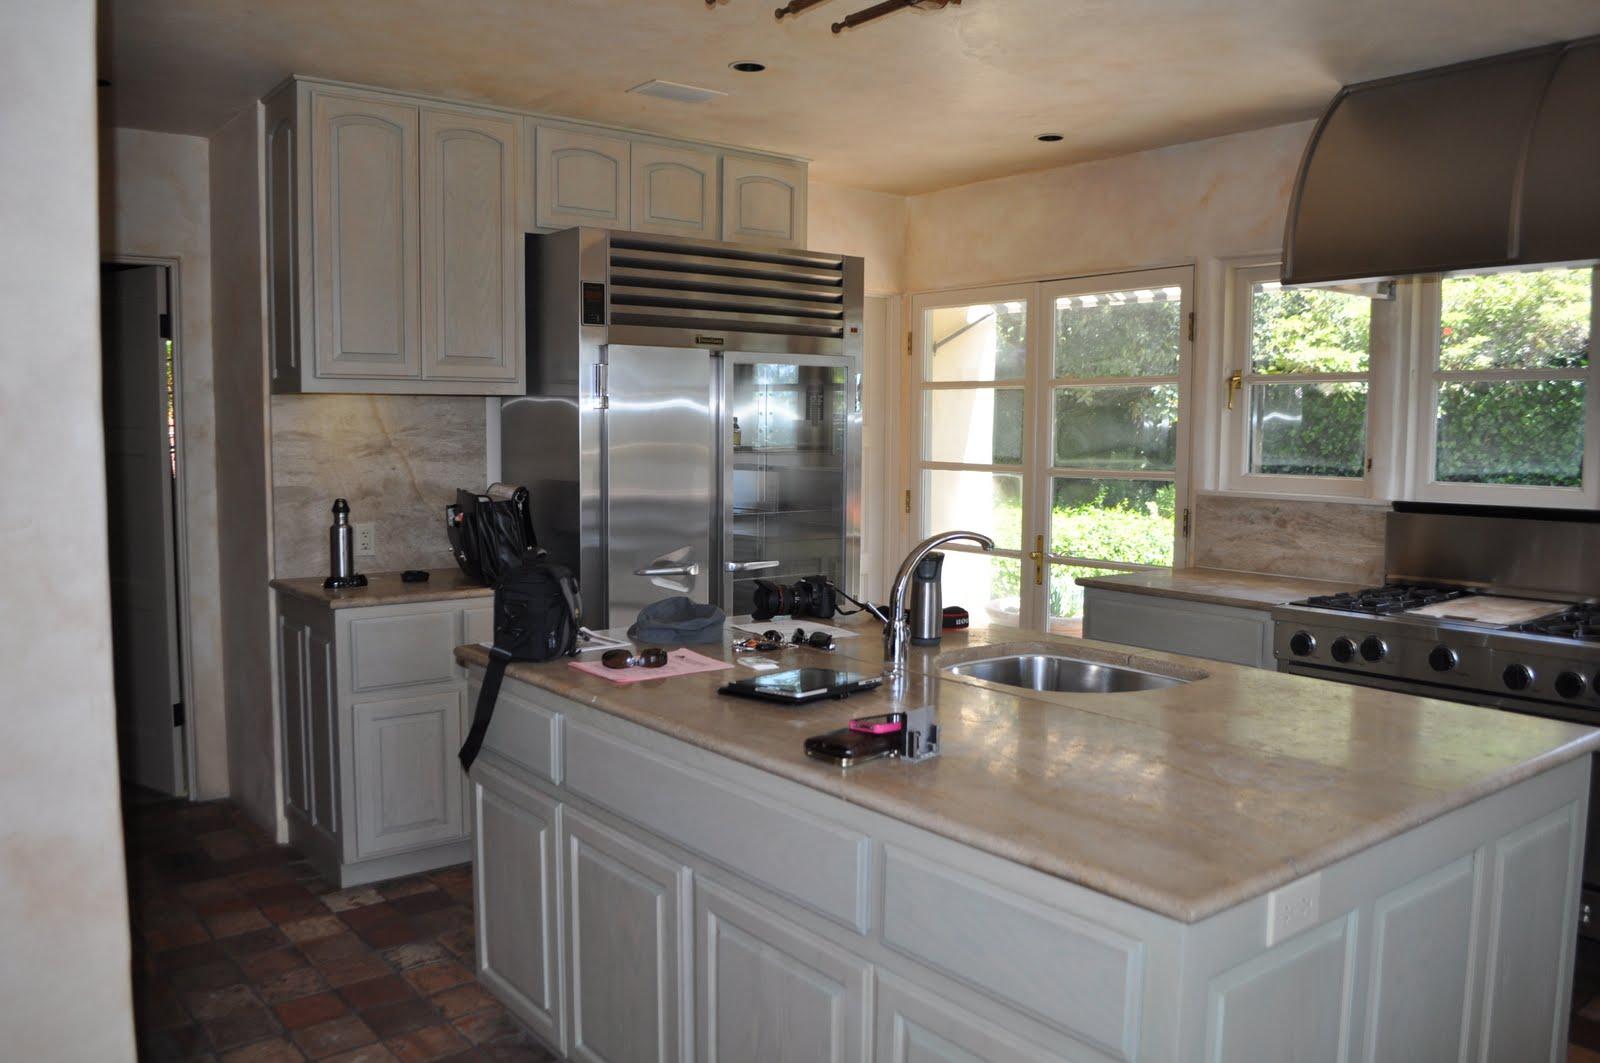 Whitewash Oak Kitchen Cabinets